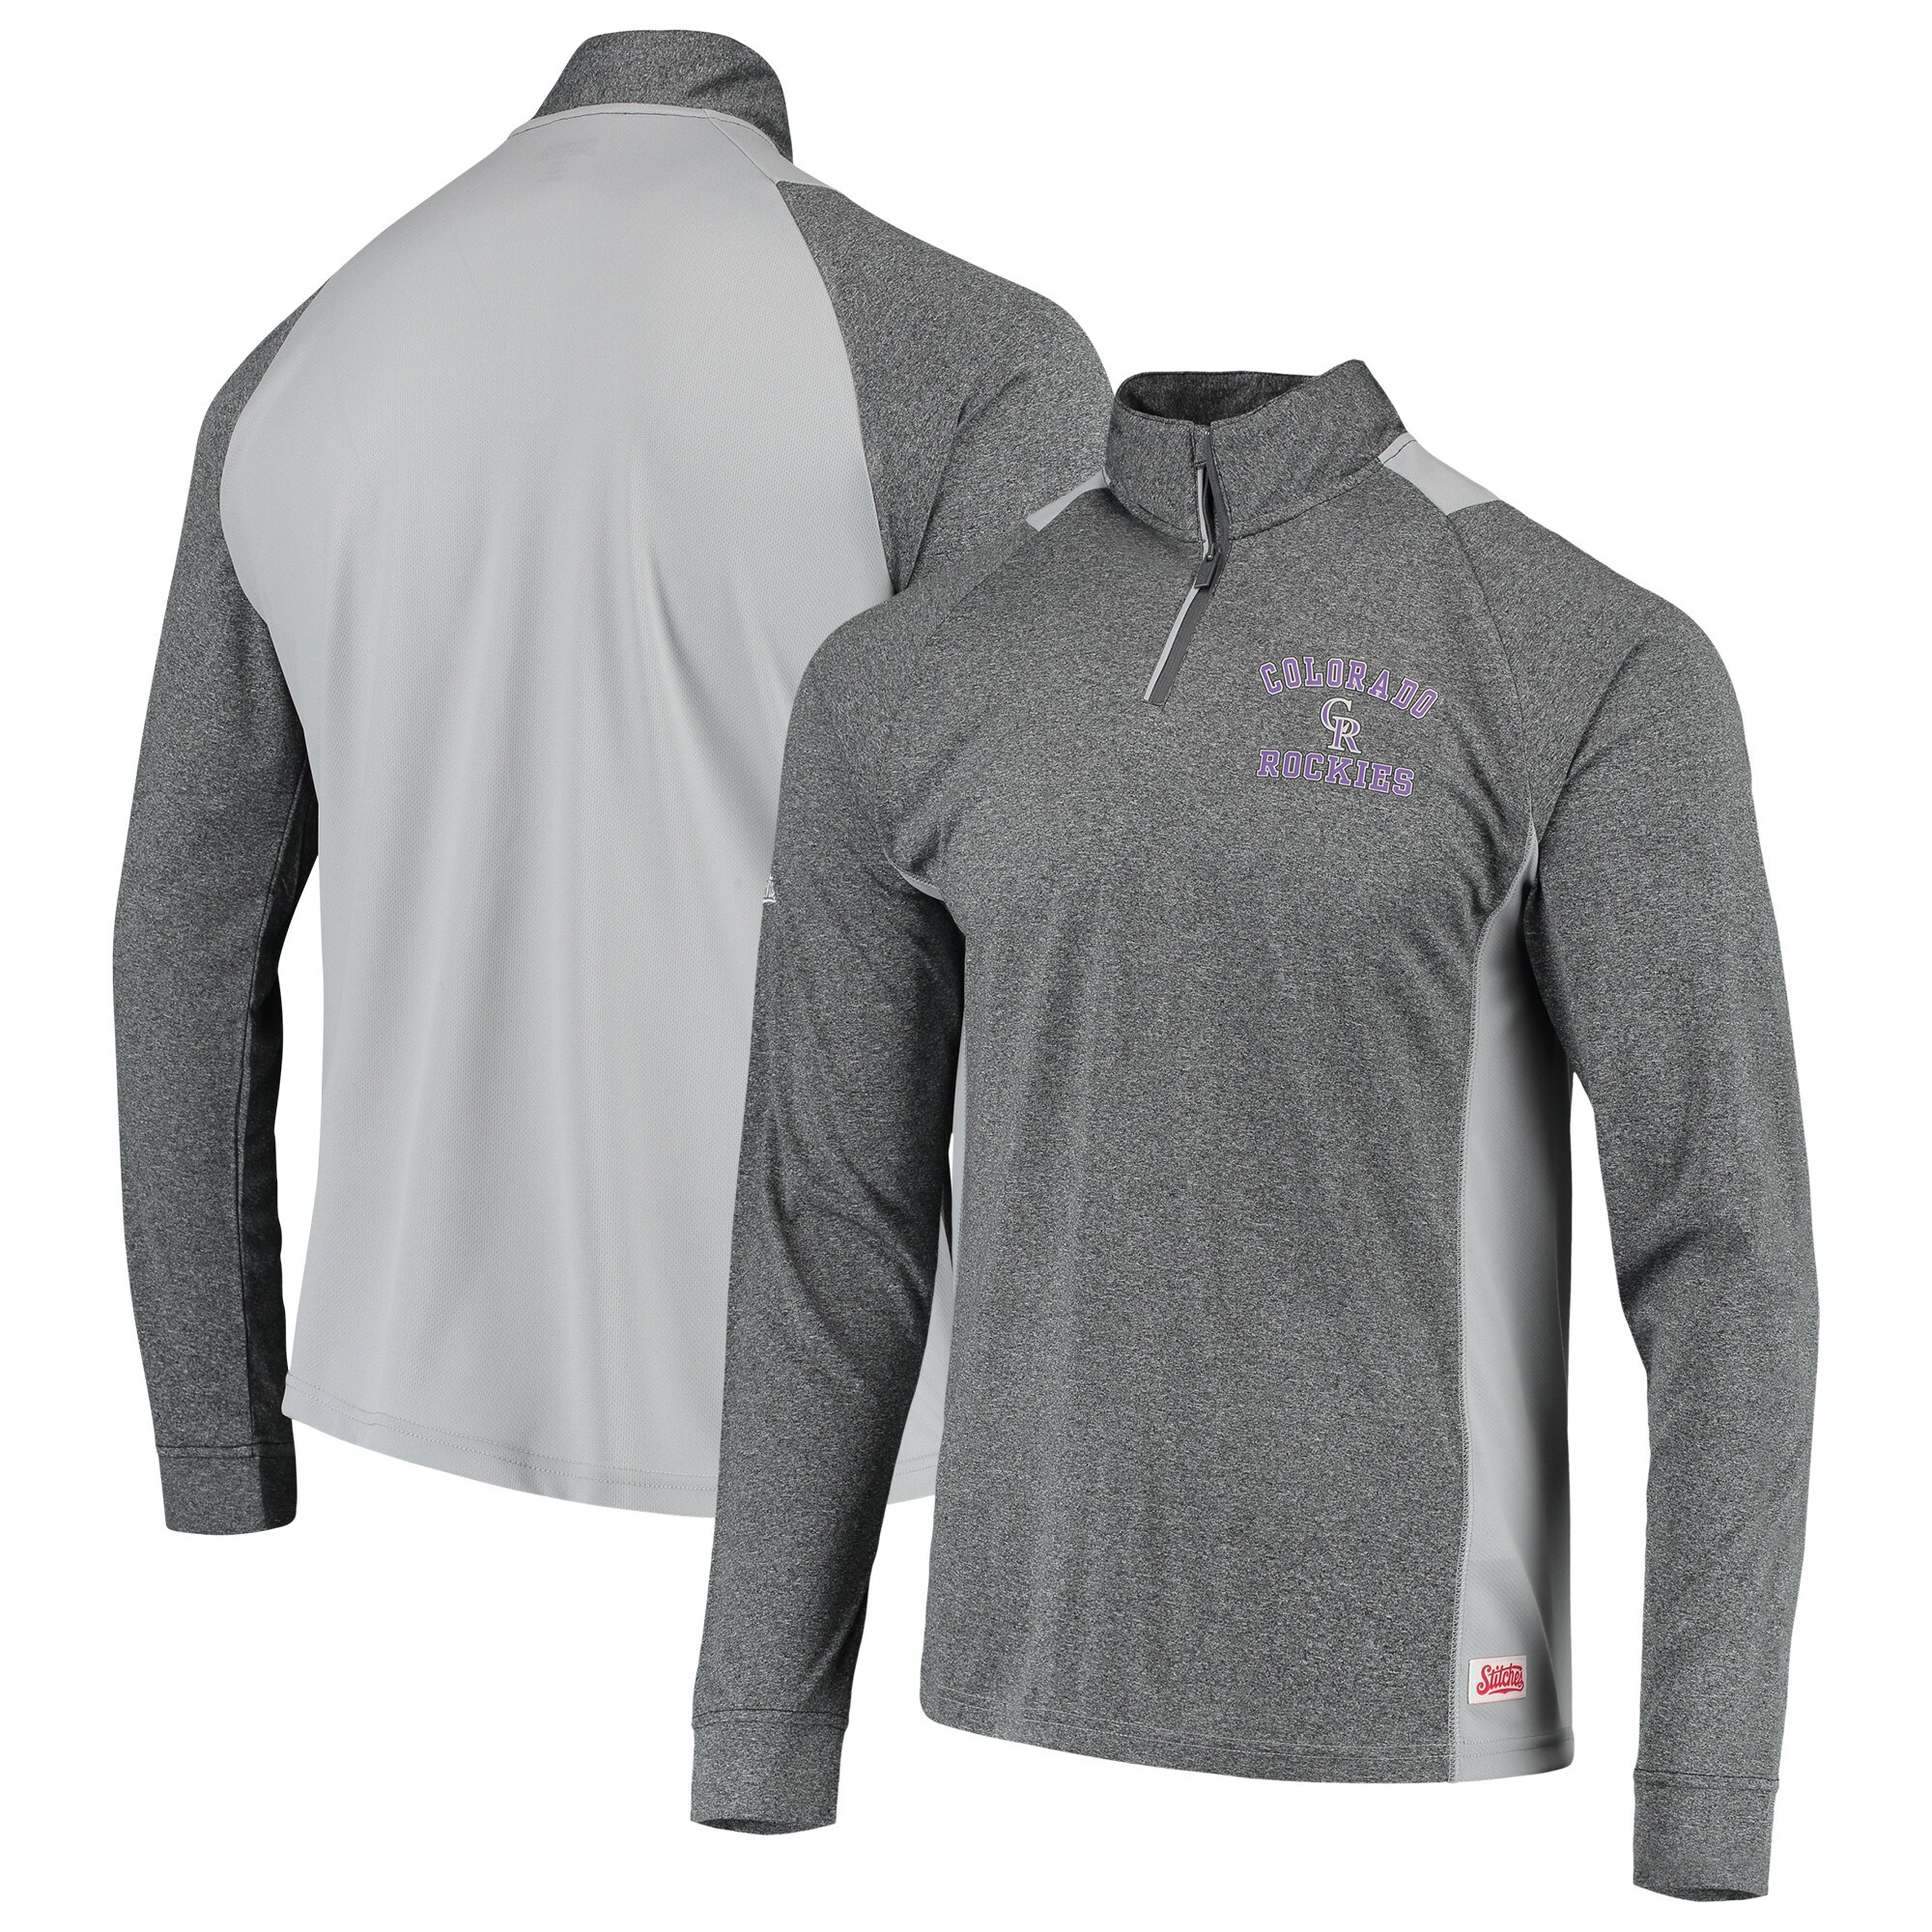 Colorado Rockies Stitches Raglan Sleeve Quarter-Zip Pullover Jacket - Heathered Charcoal/Gray